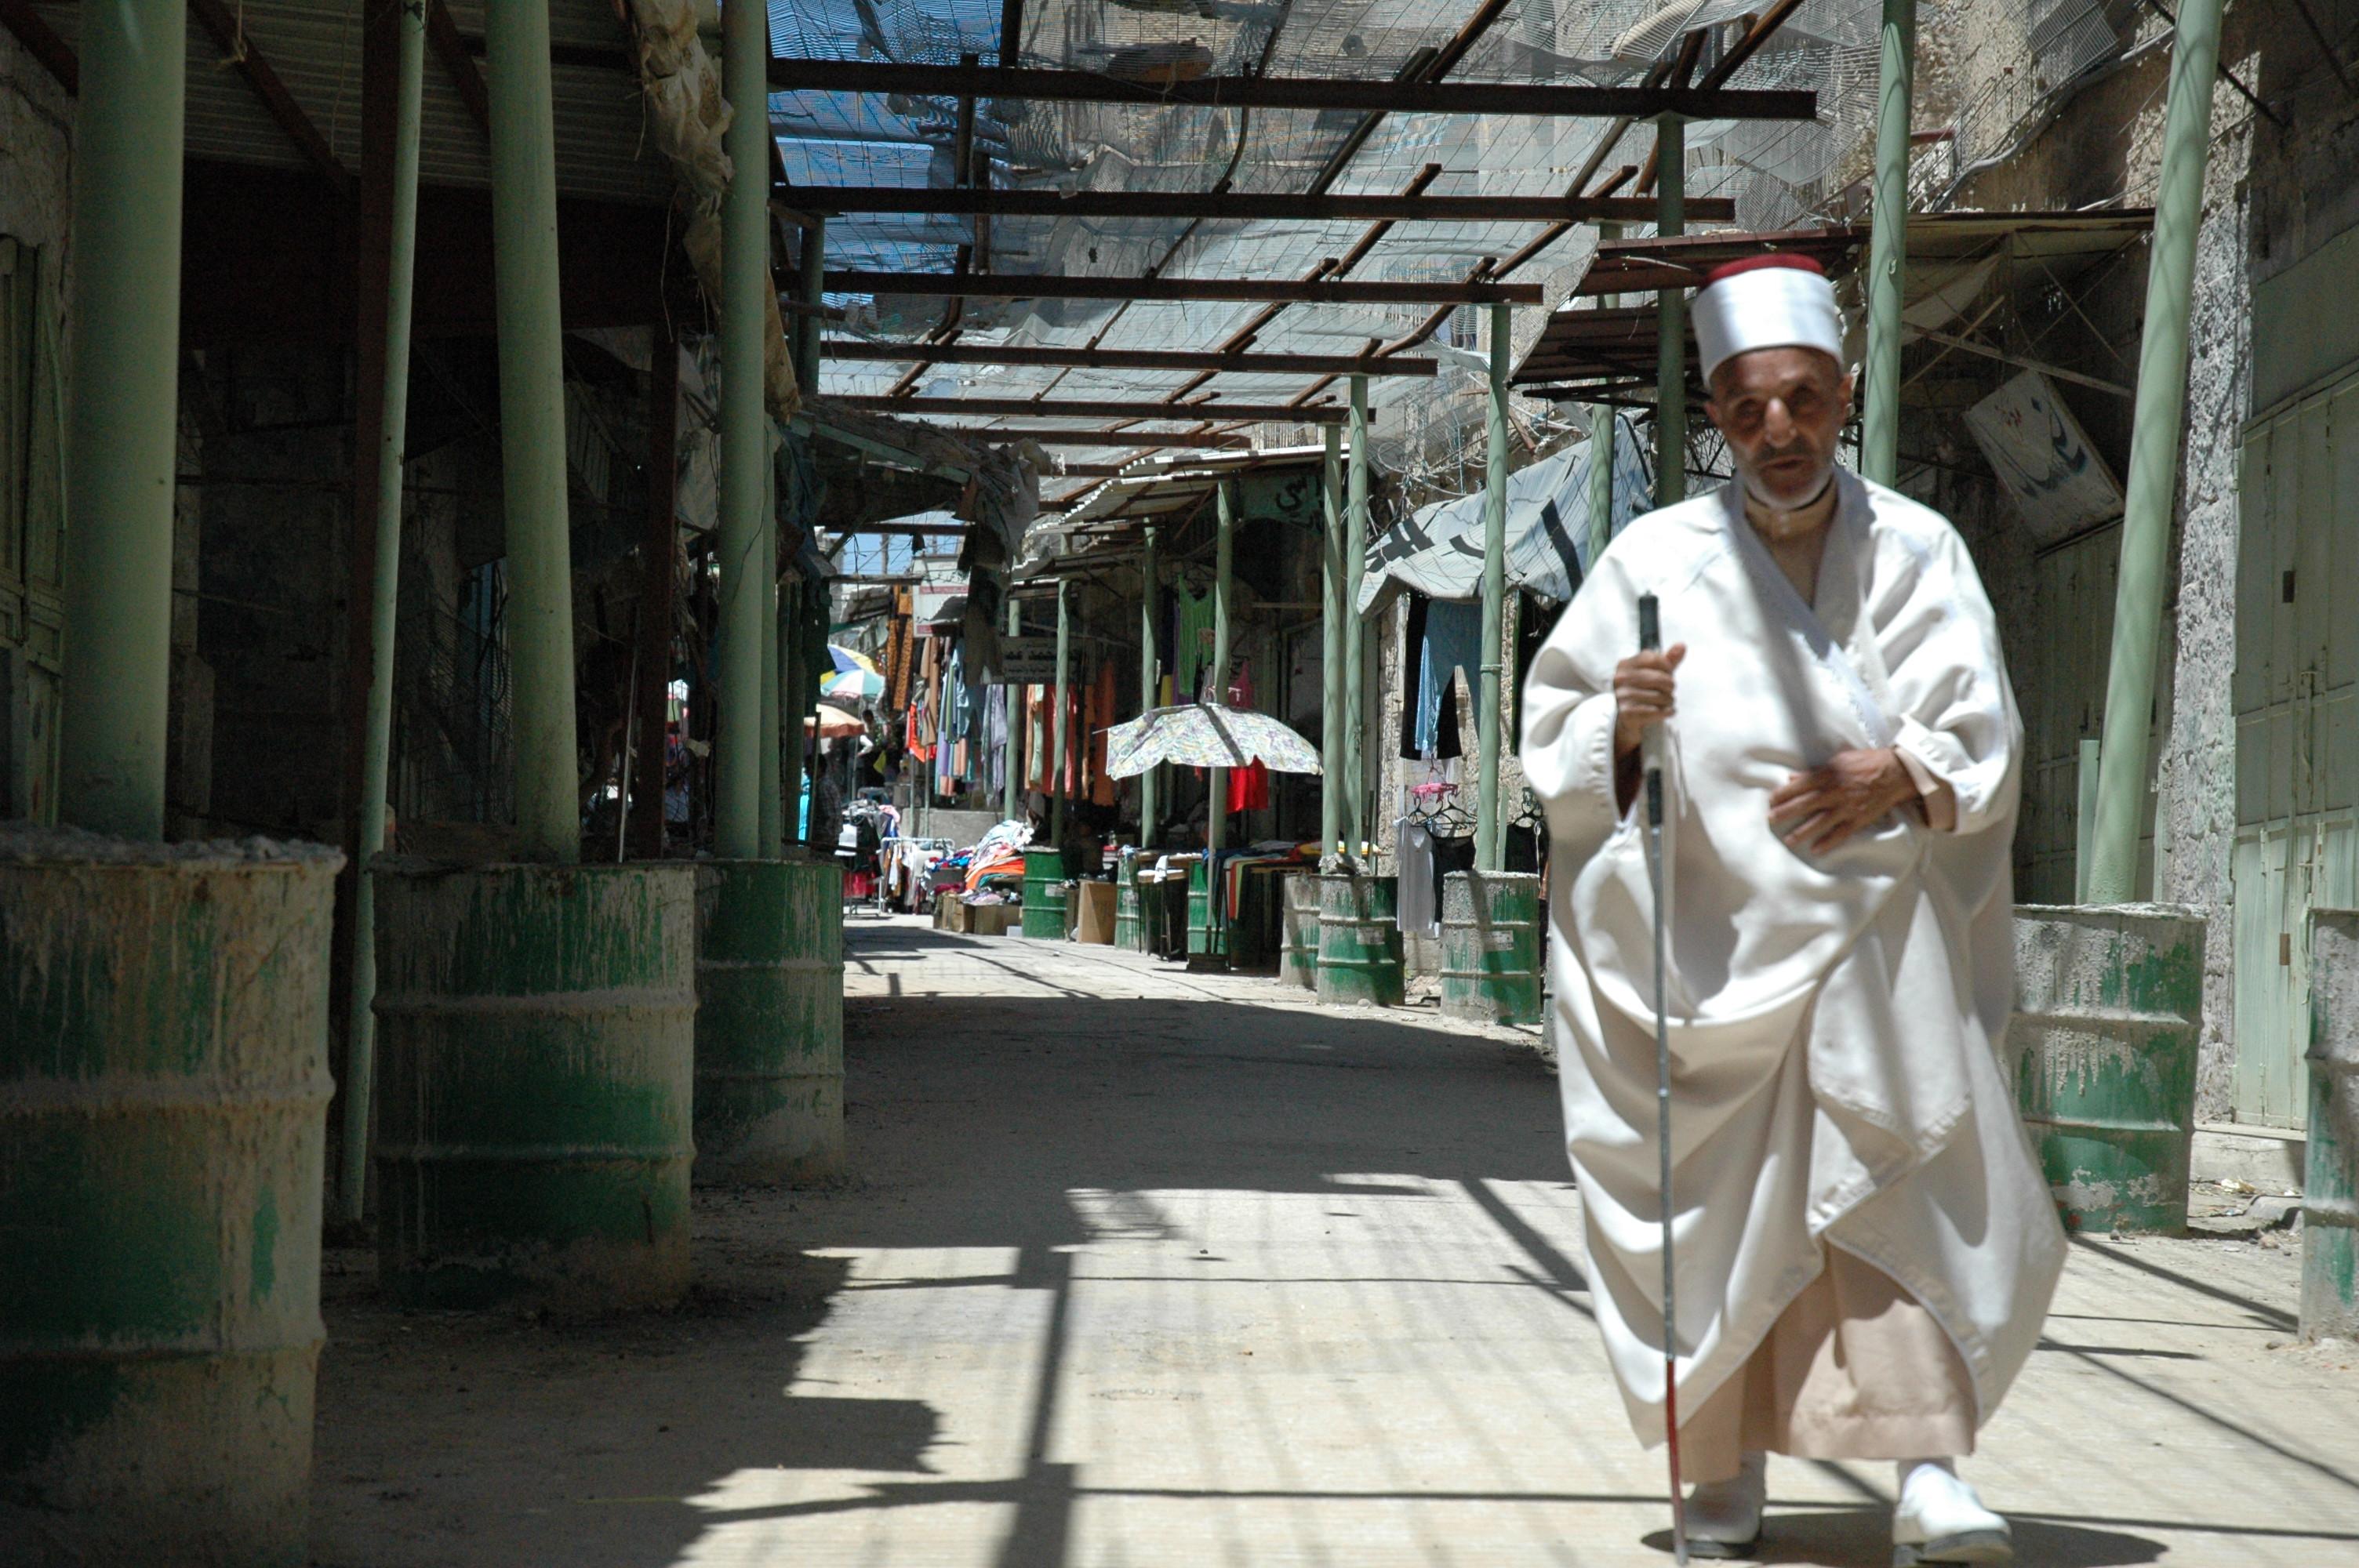 http://upload.wikimedia.org/wikipedia/commons/b/b2/Deserted_Old_City_Market_(Hebron).jpg